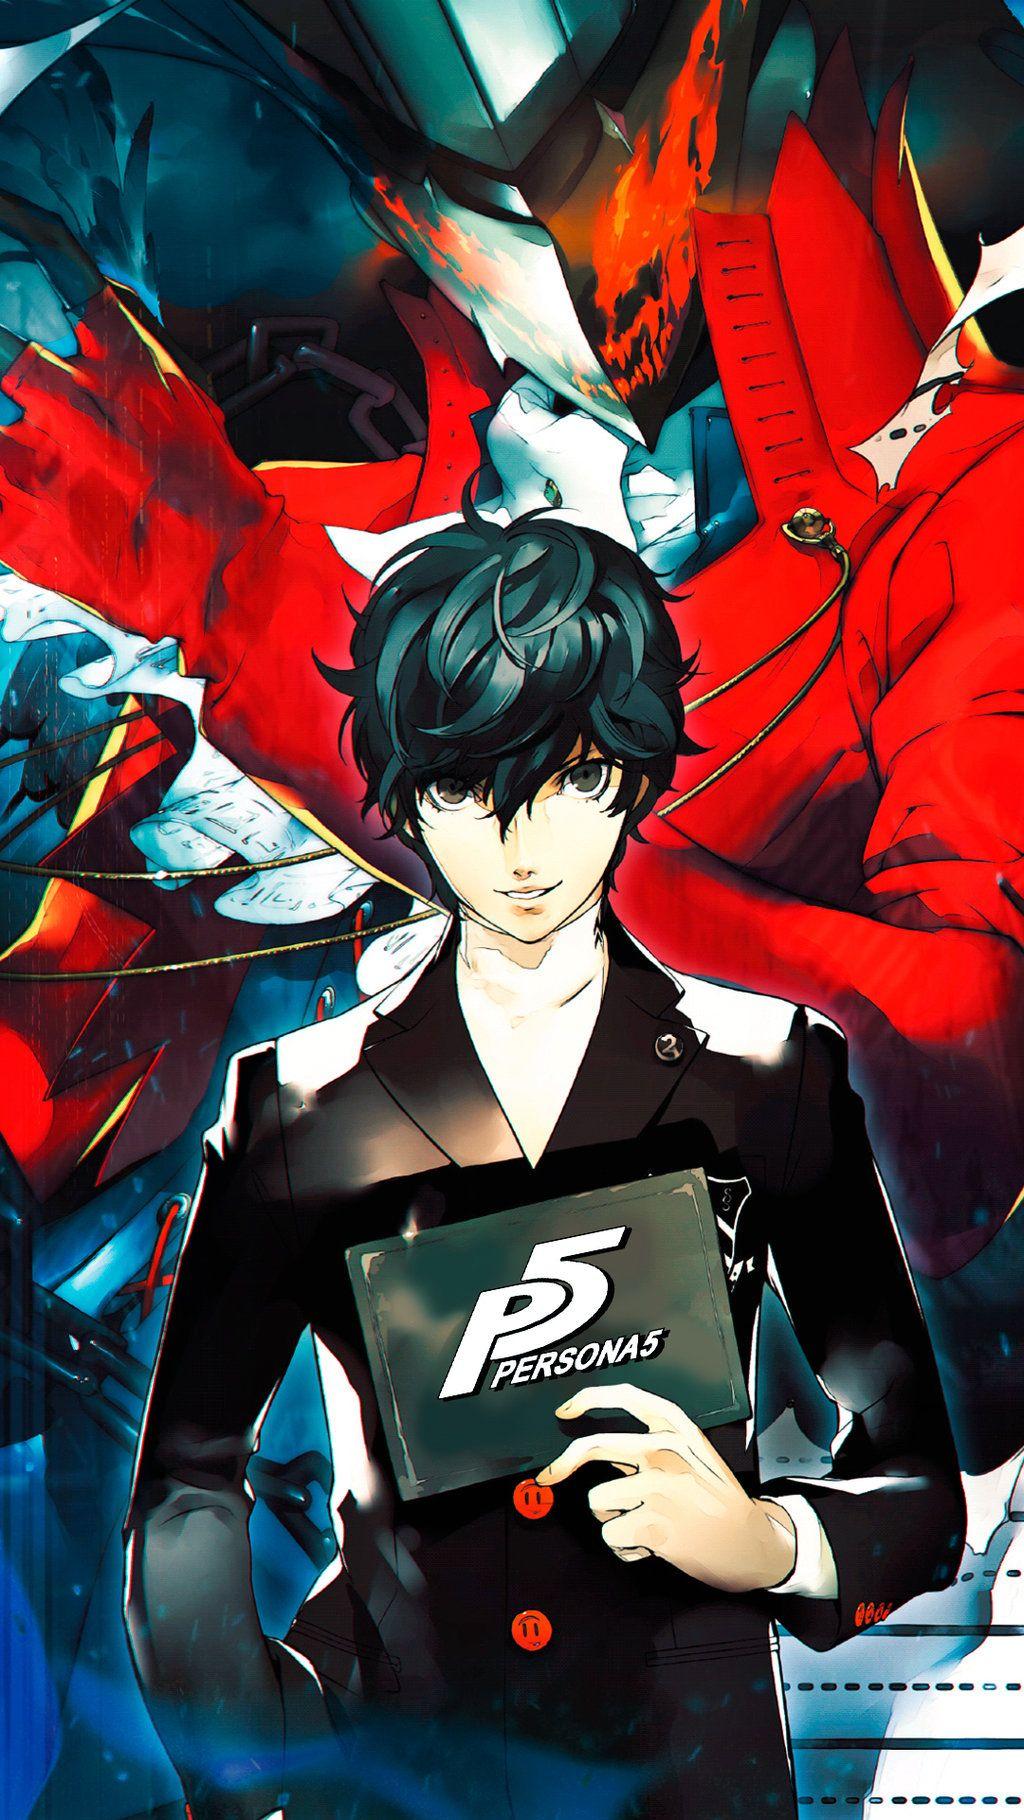 Persona 5 Wallpaper For Smartphone By De Monvarela On Persona 5